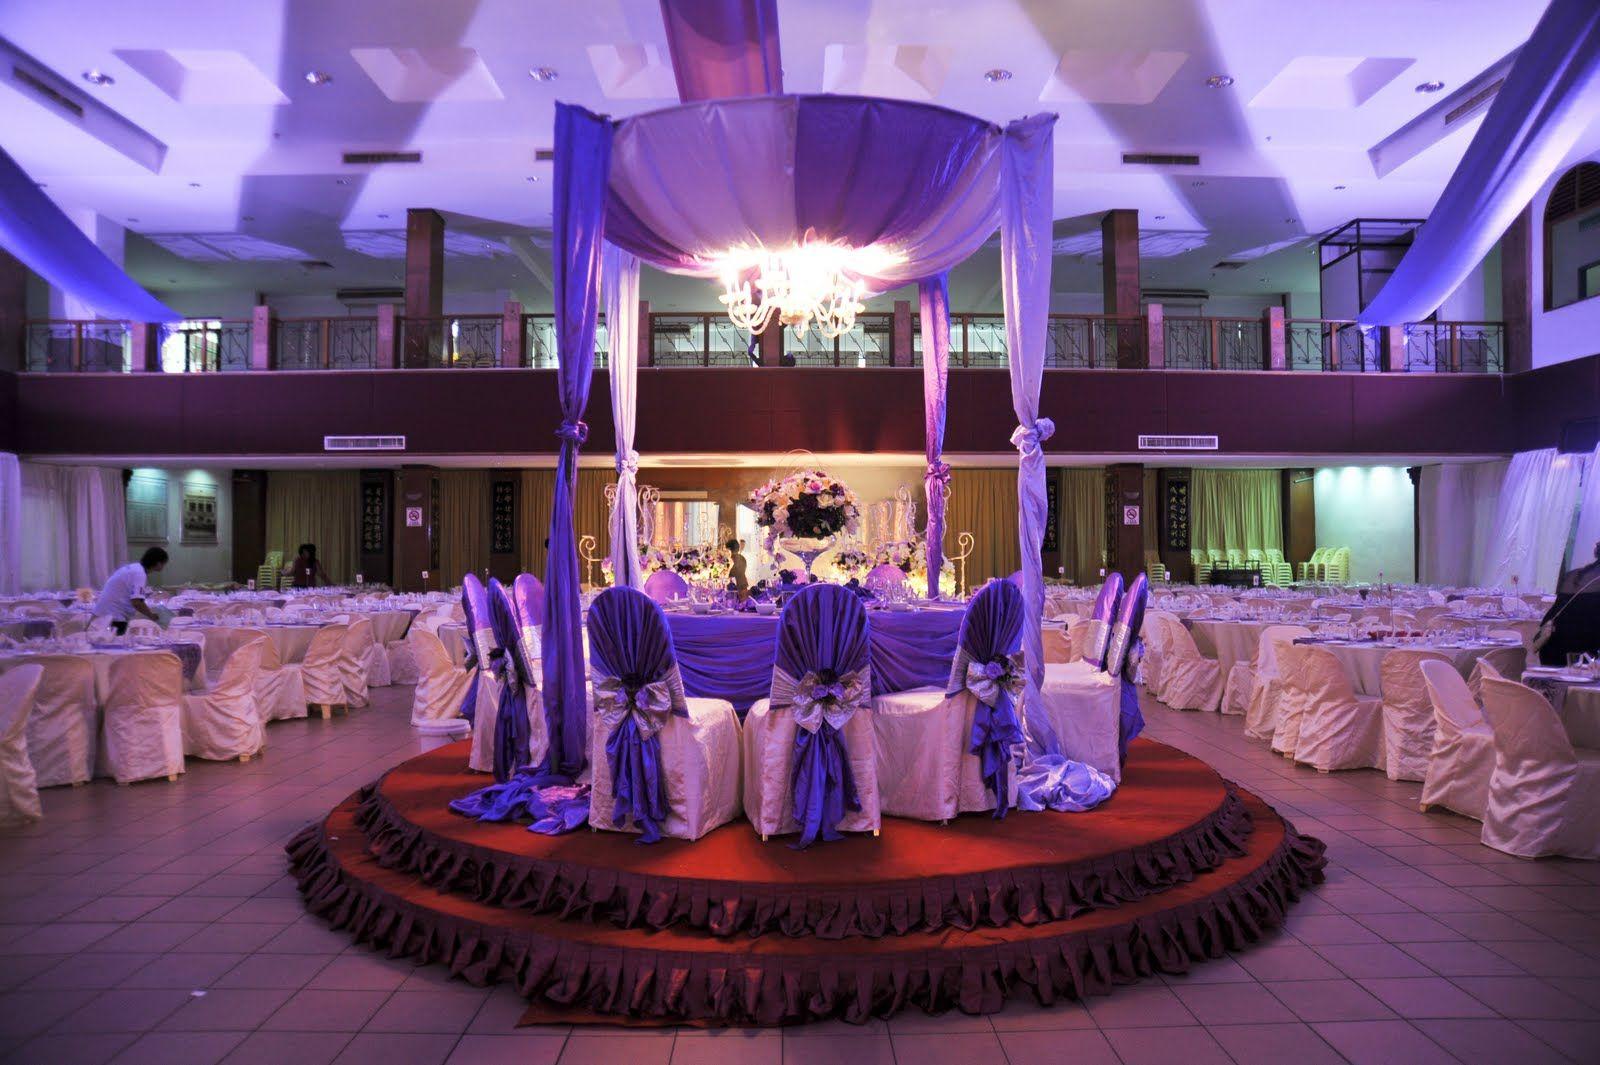 Wedding Halls Decorating To Match Your Wedding Venue Ideas